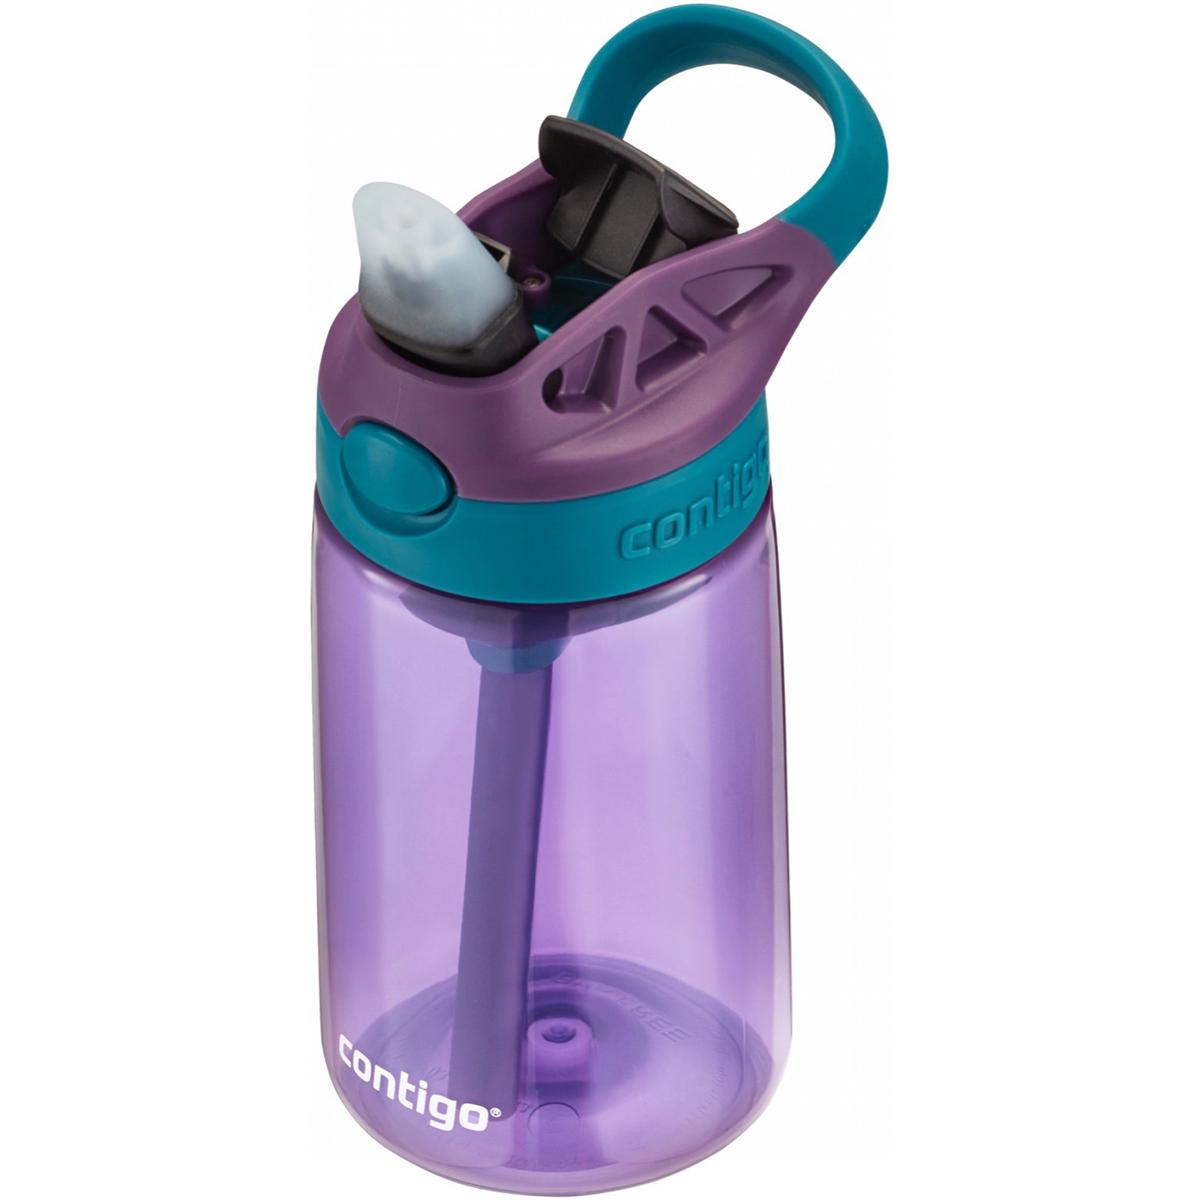 Contigo-Kid-039-s-14-oz-AutoSpout-Straw-Water-Bottle-with-Easy-Clean-Lid thumbnail 16